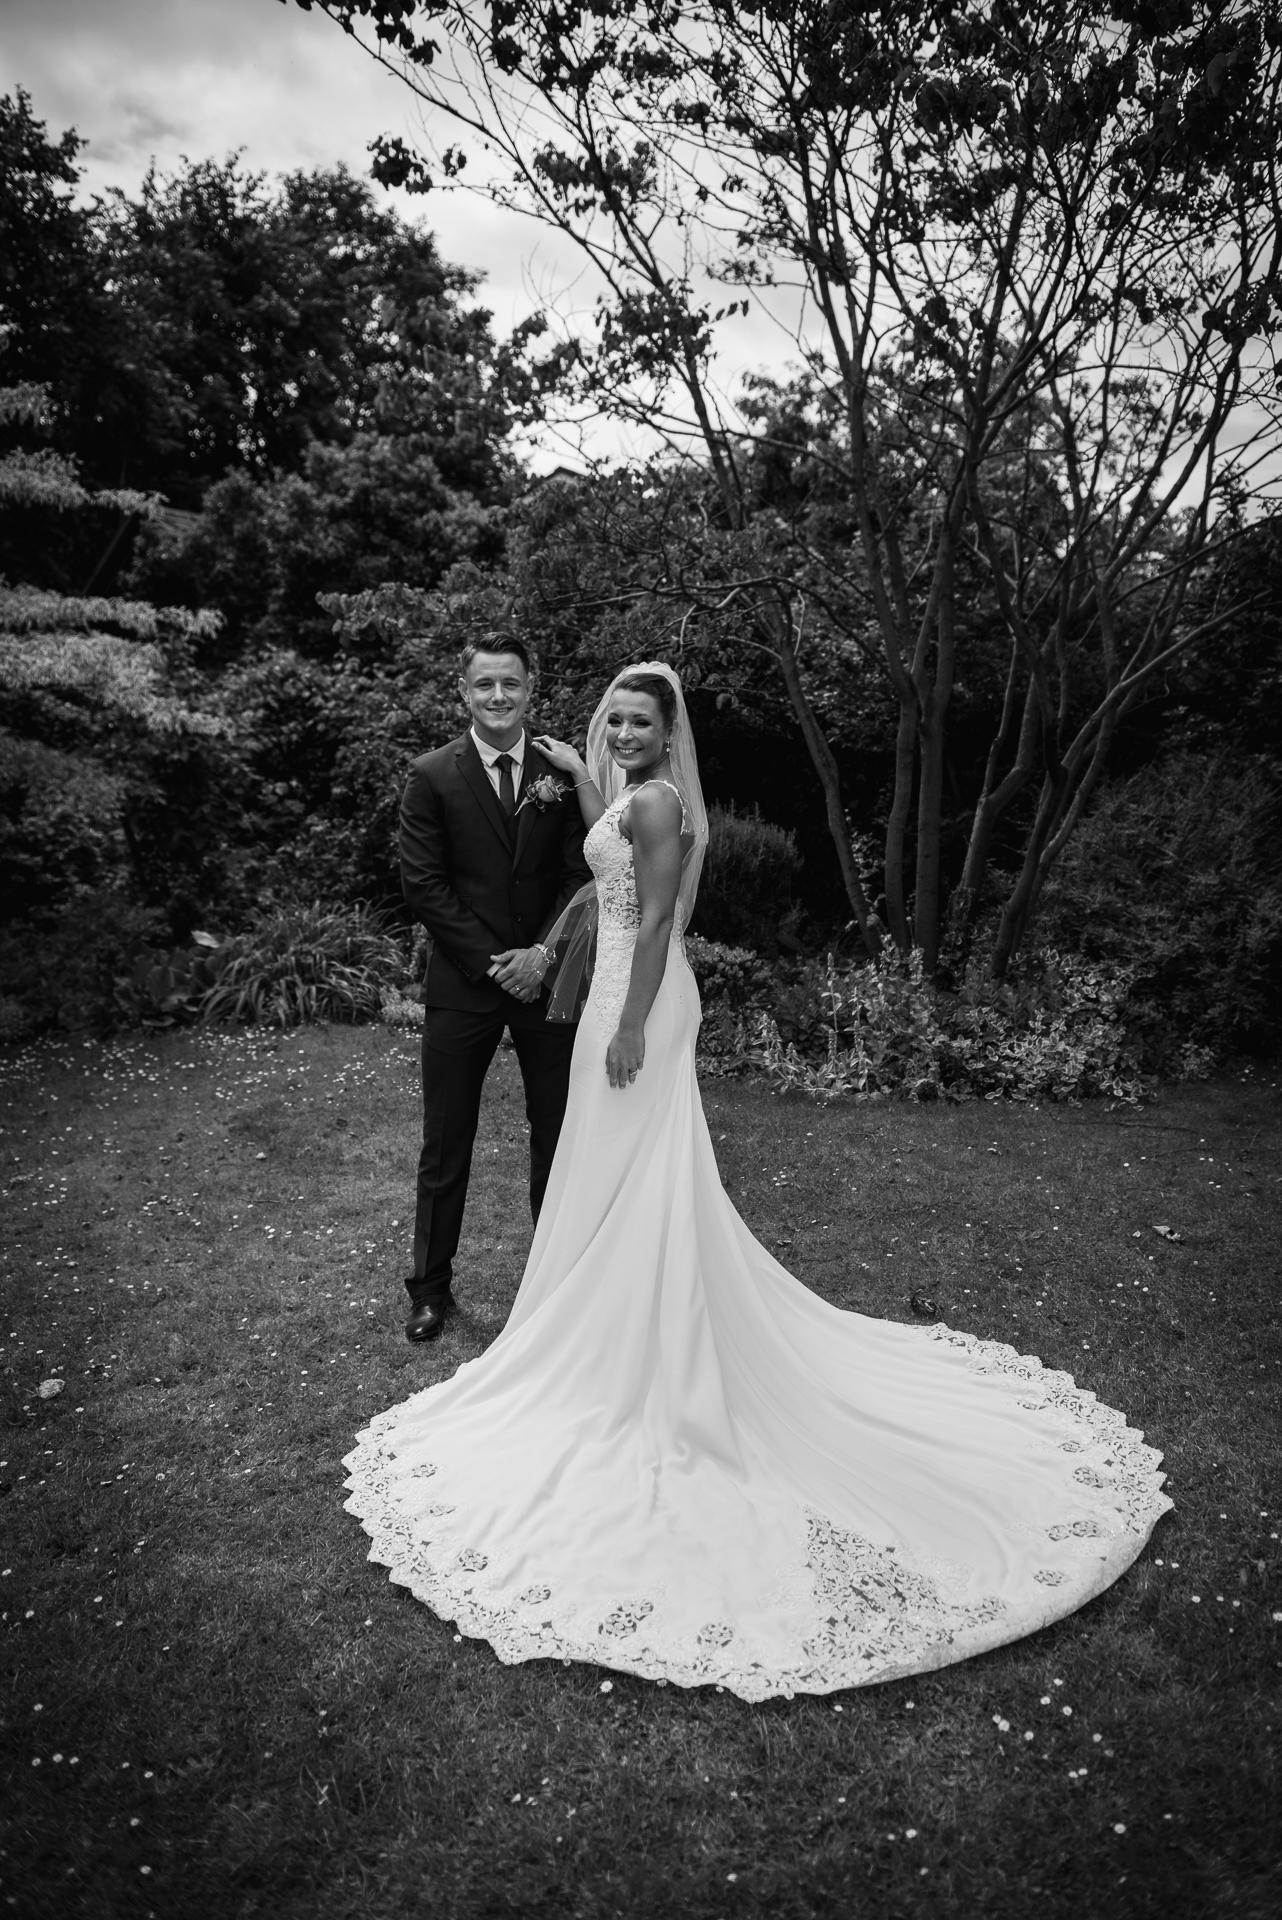 Ufton Court Wedding Photography22.JPG